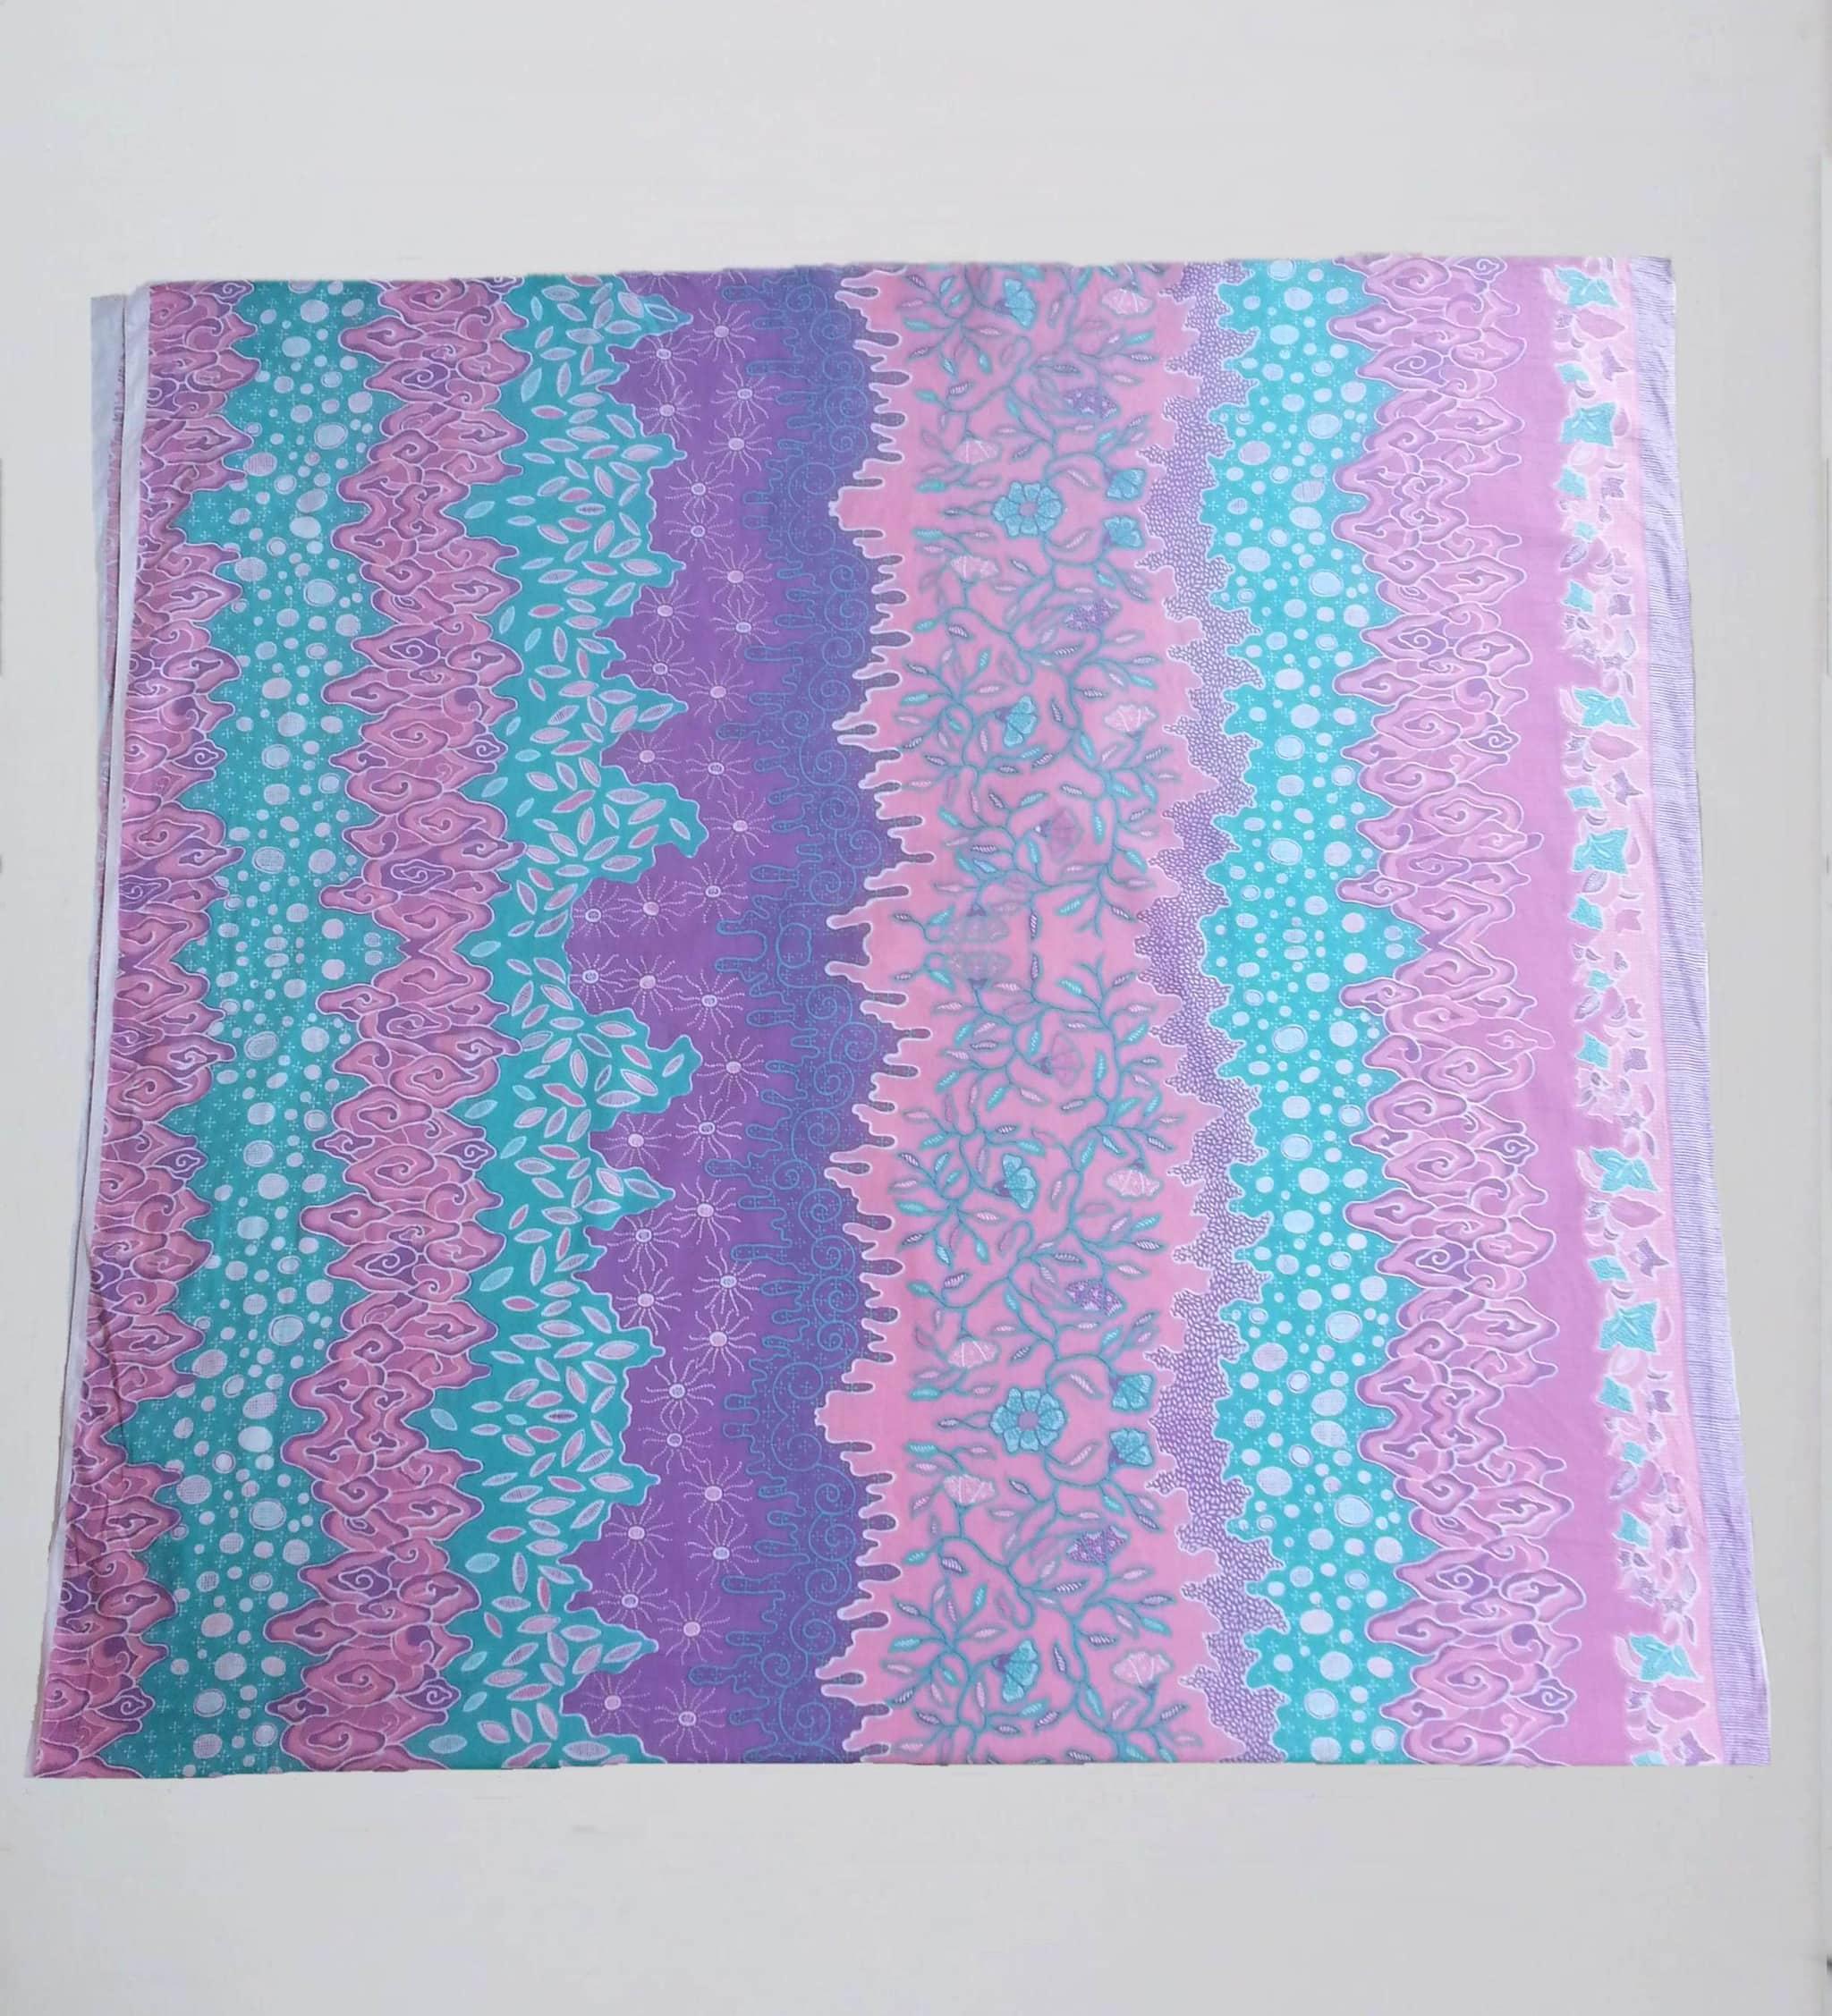 Ulasan Produk kain batik warna pastel  soft  BATIK PEKALONGAN